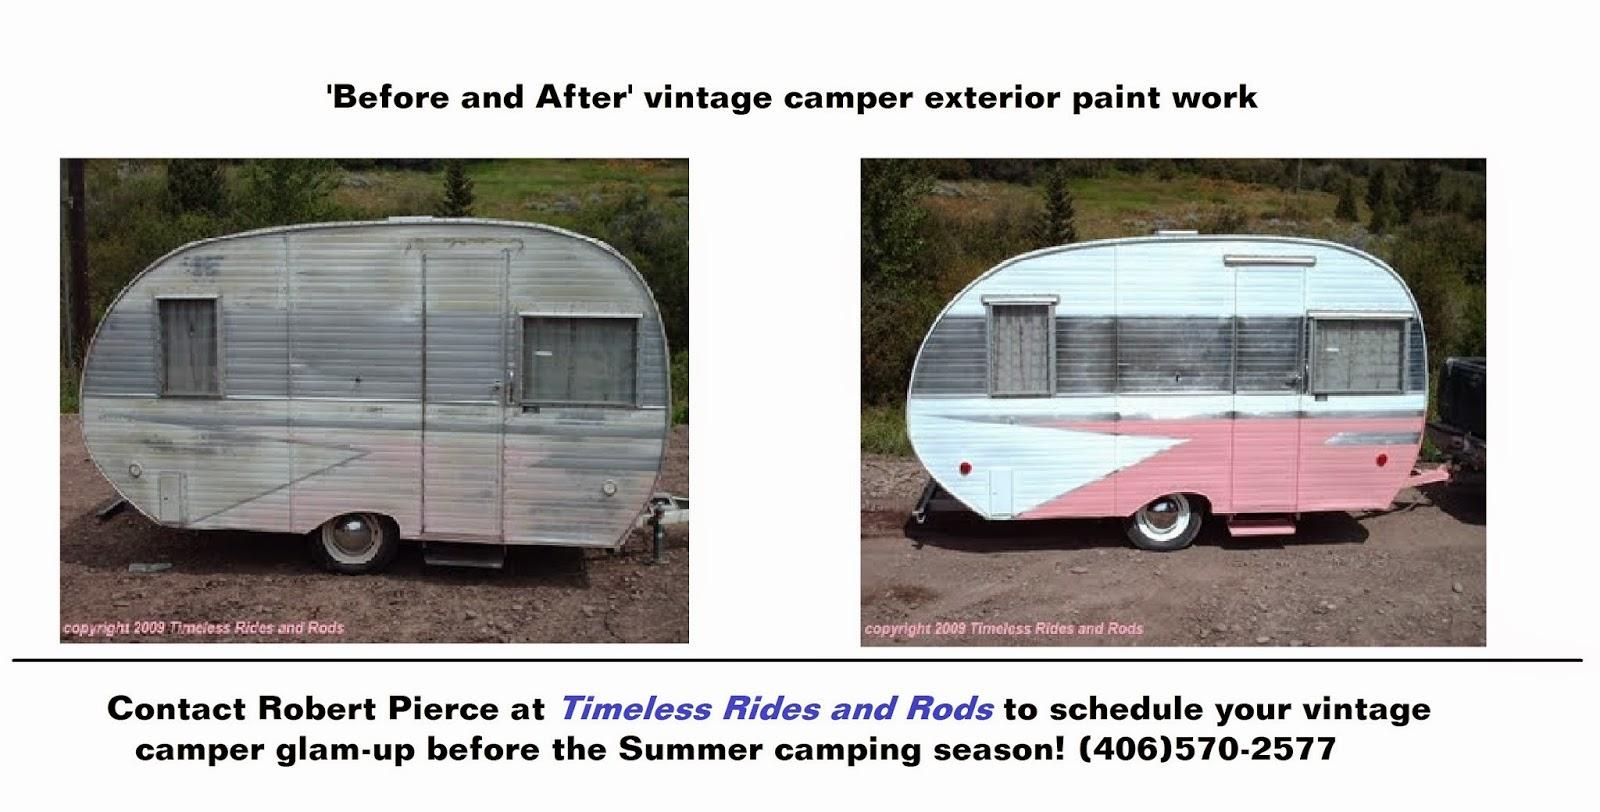 Vintage Camper Exterior BEFORE And AFTER